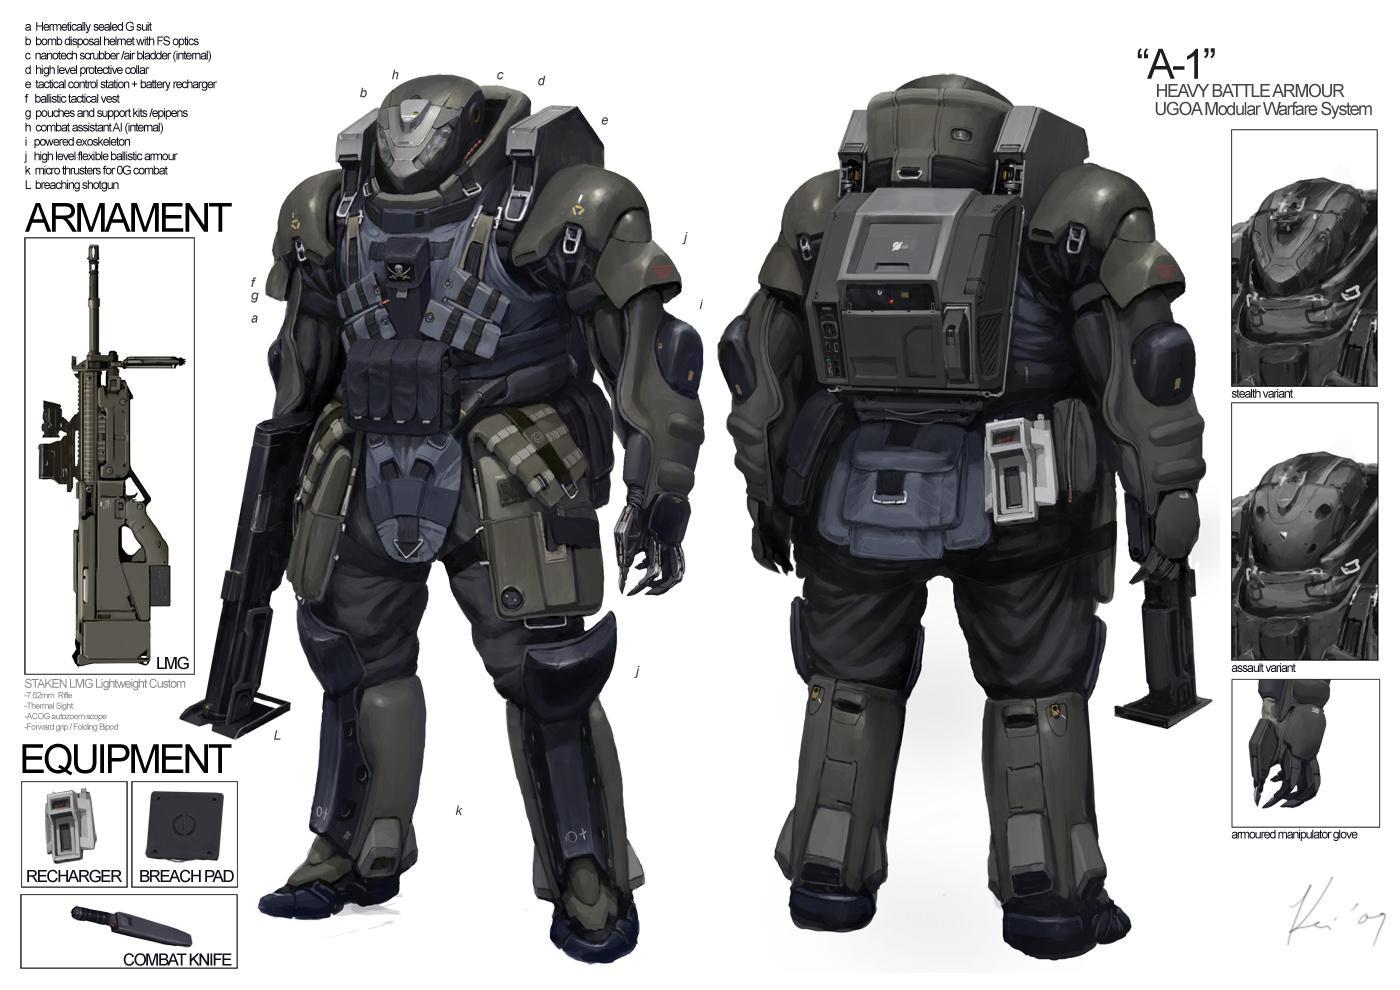 Space Vagabonds: Assaulter by ukitakumuki